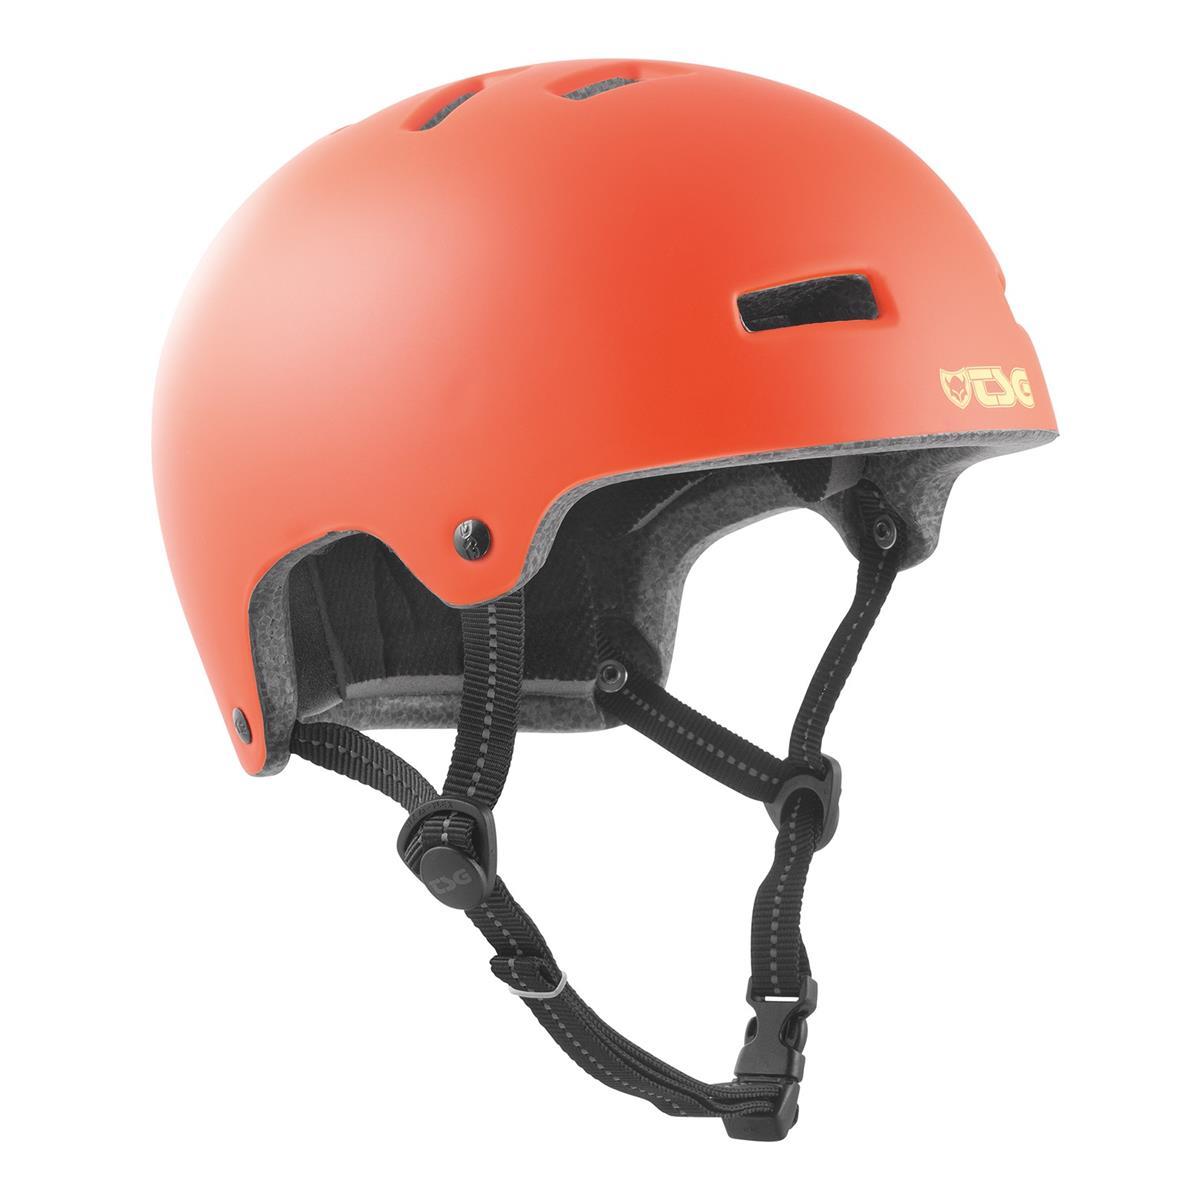 TSG Kids BMX/Dirt Helm Nipper Maxi Solid Color - Satin Lychee